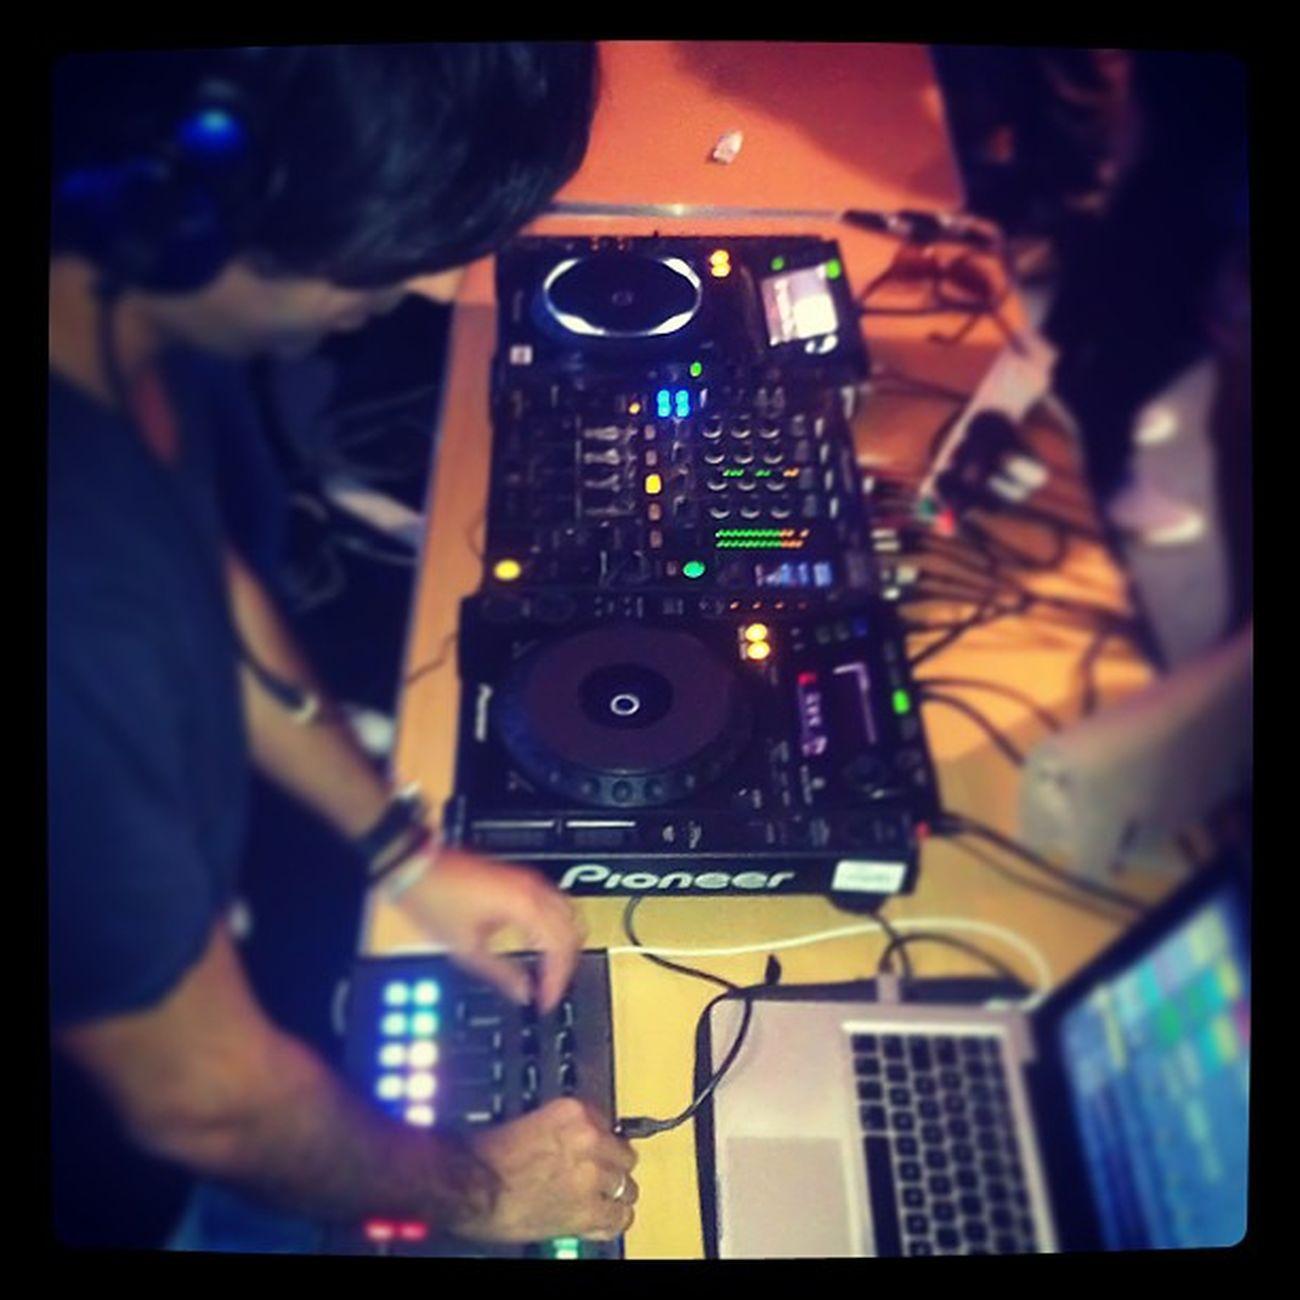 My favourite Dj working is Melodic magic! Guyj Balance Edm Pioneer Livid MacBookPro CDJ APOGEE Ableton Live9 Music Dance Ilovehouse Ilovedance